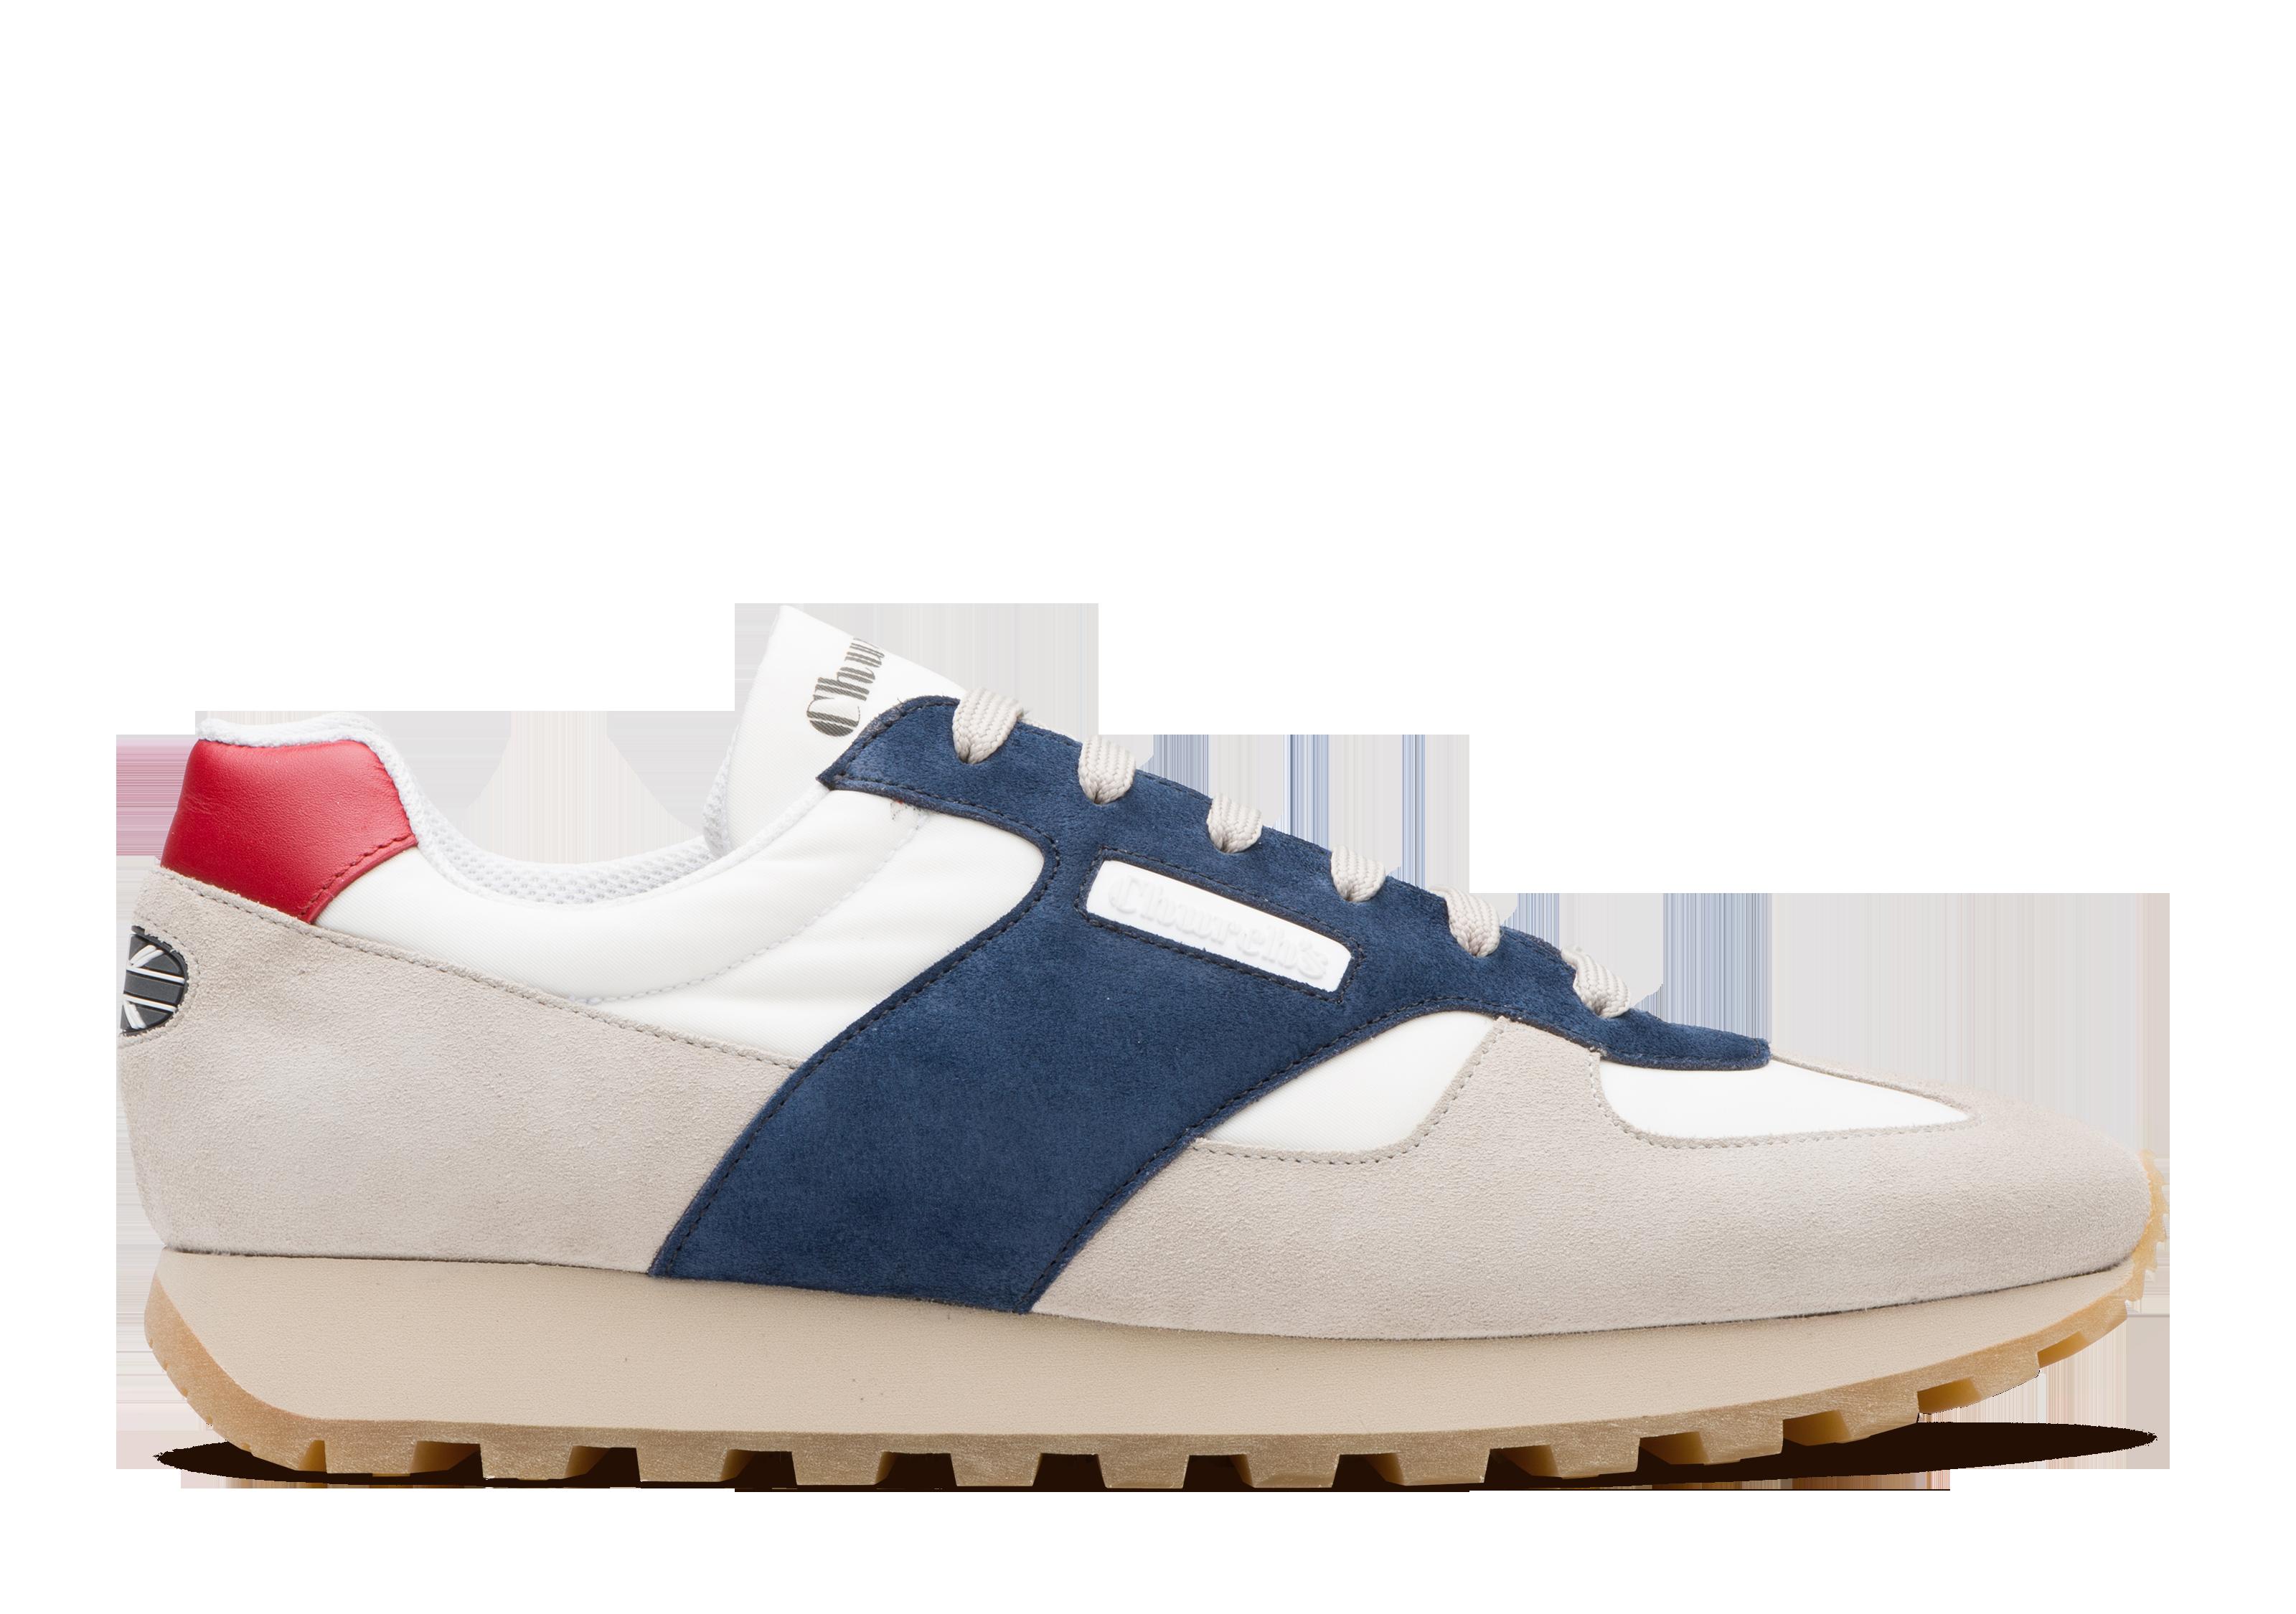 Church's men's designer shoes | Church's